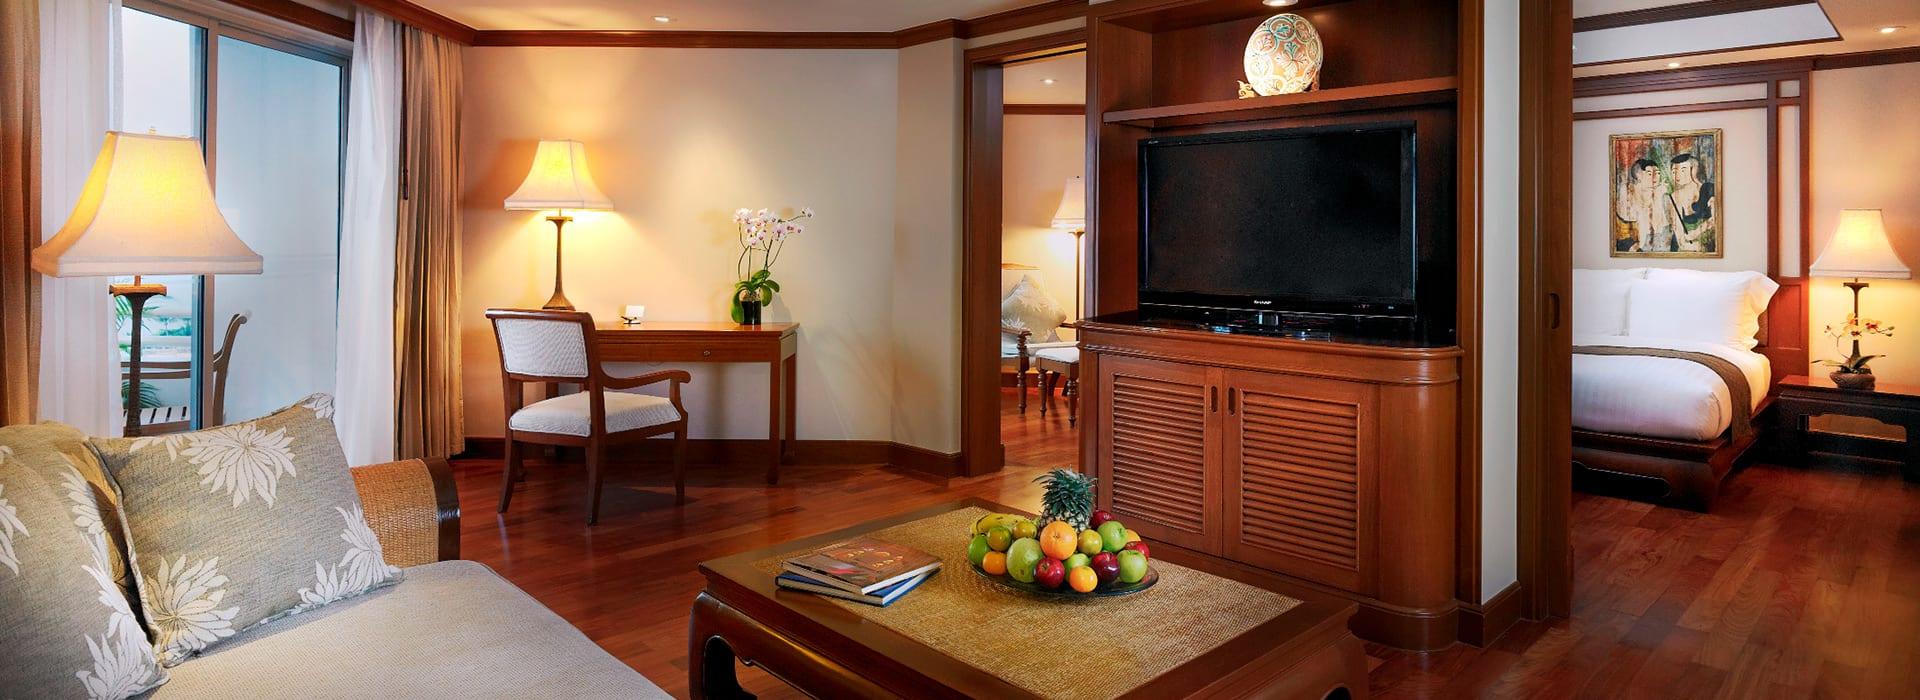 AVANI Pattaya Resort & Spa - AVANI One Bedroom Suite - Living Room